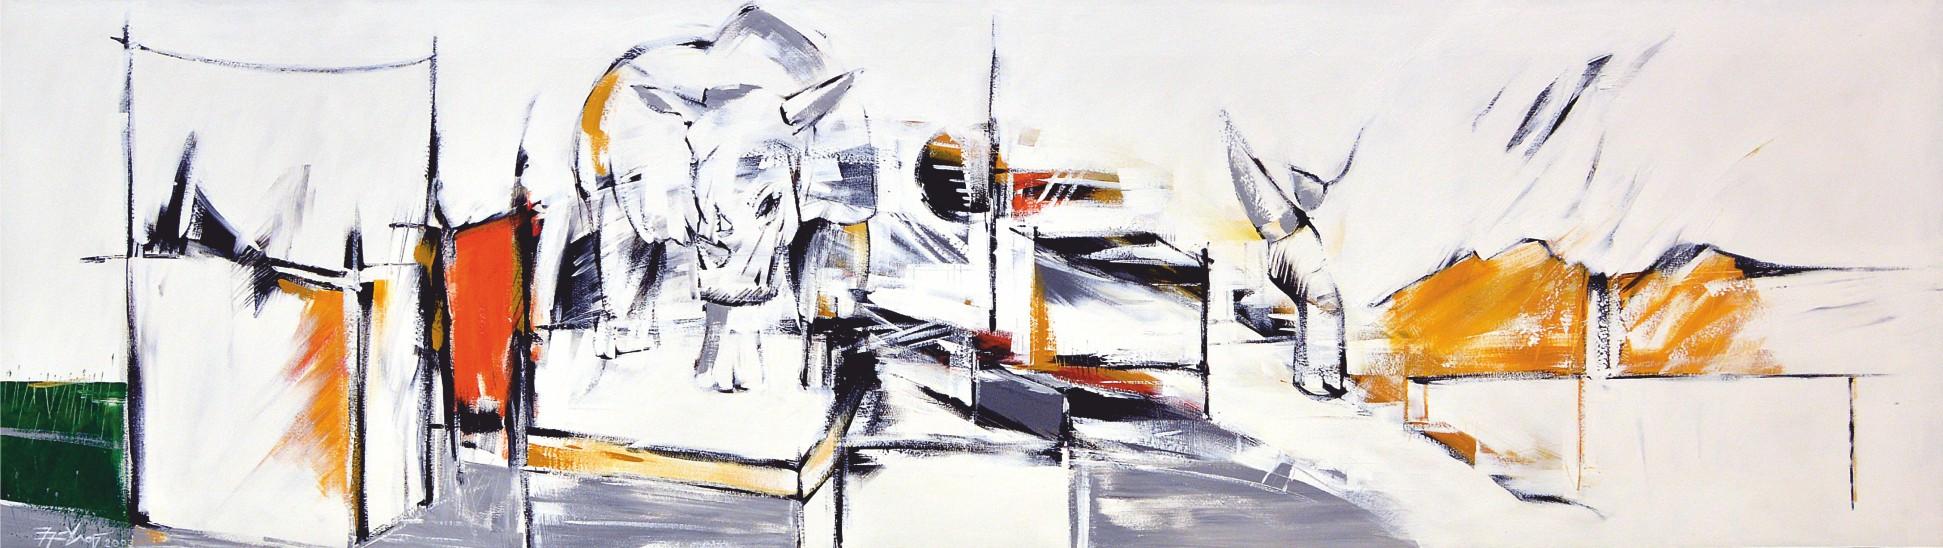 Nashorn - Pigmente, Leinwand - 2003 - 100 x 350 cm